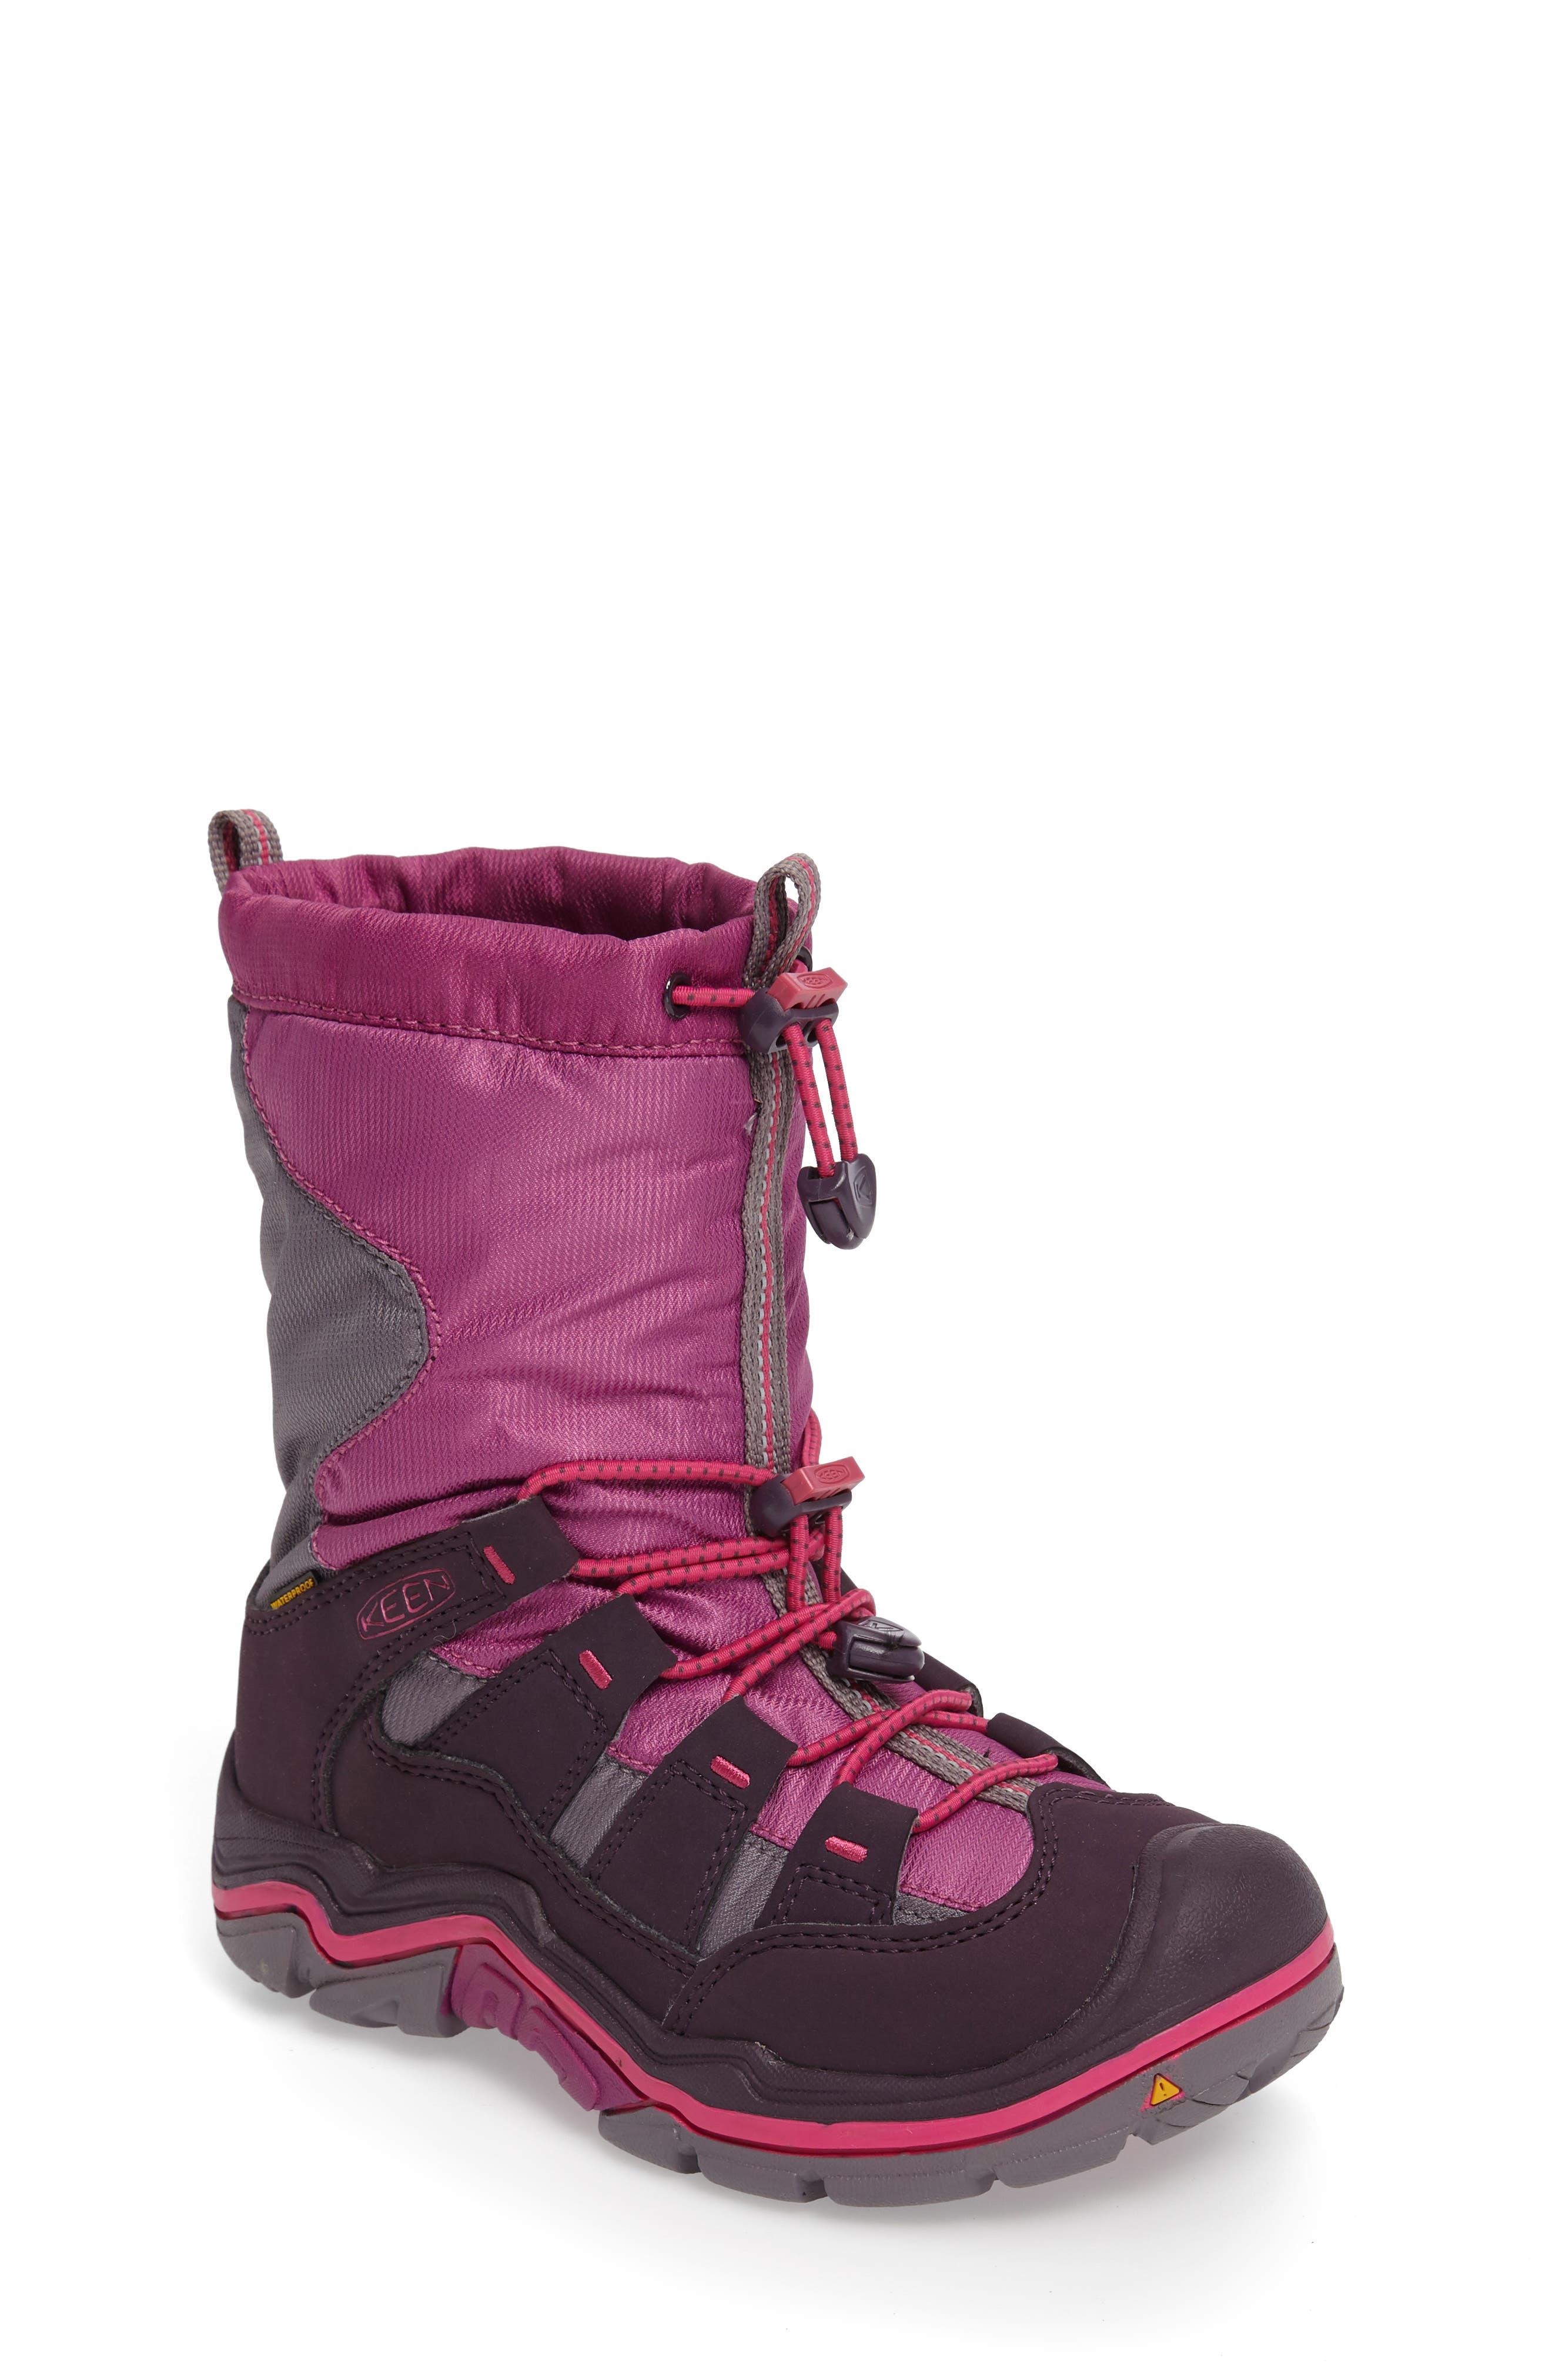 Winterport II Waterproof Boot,                             Alternate thumbnail 7, color,